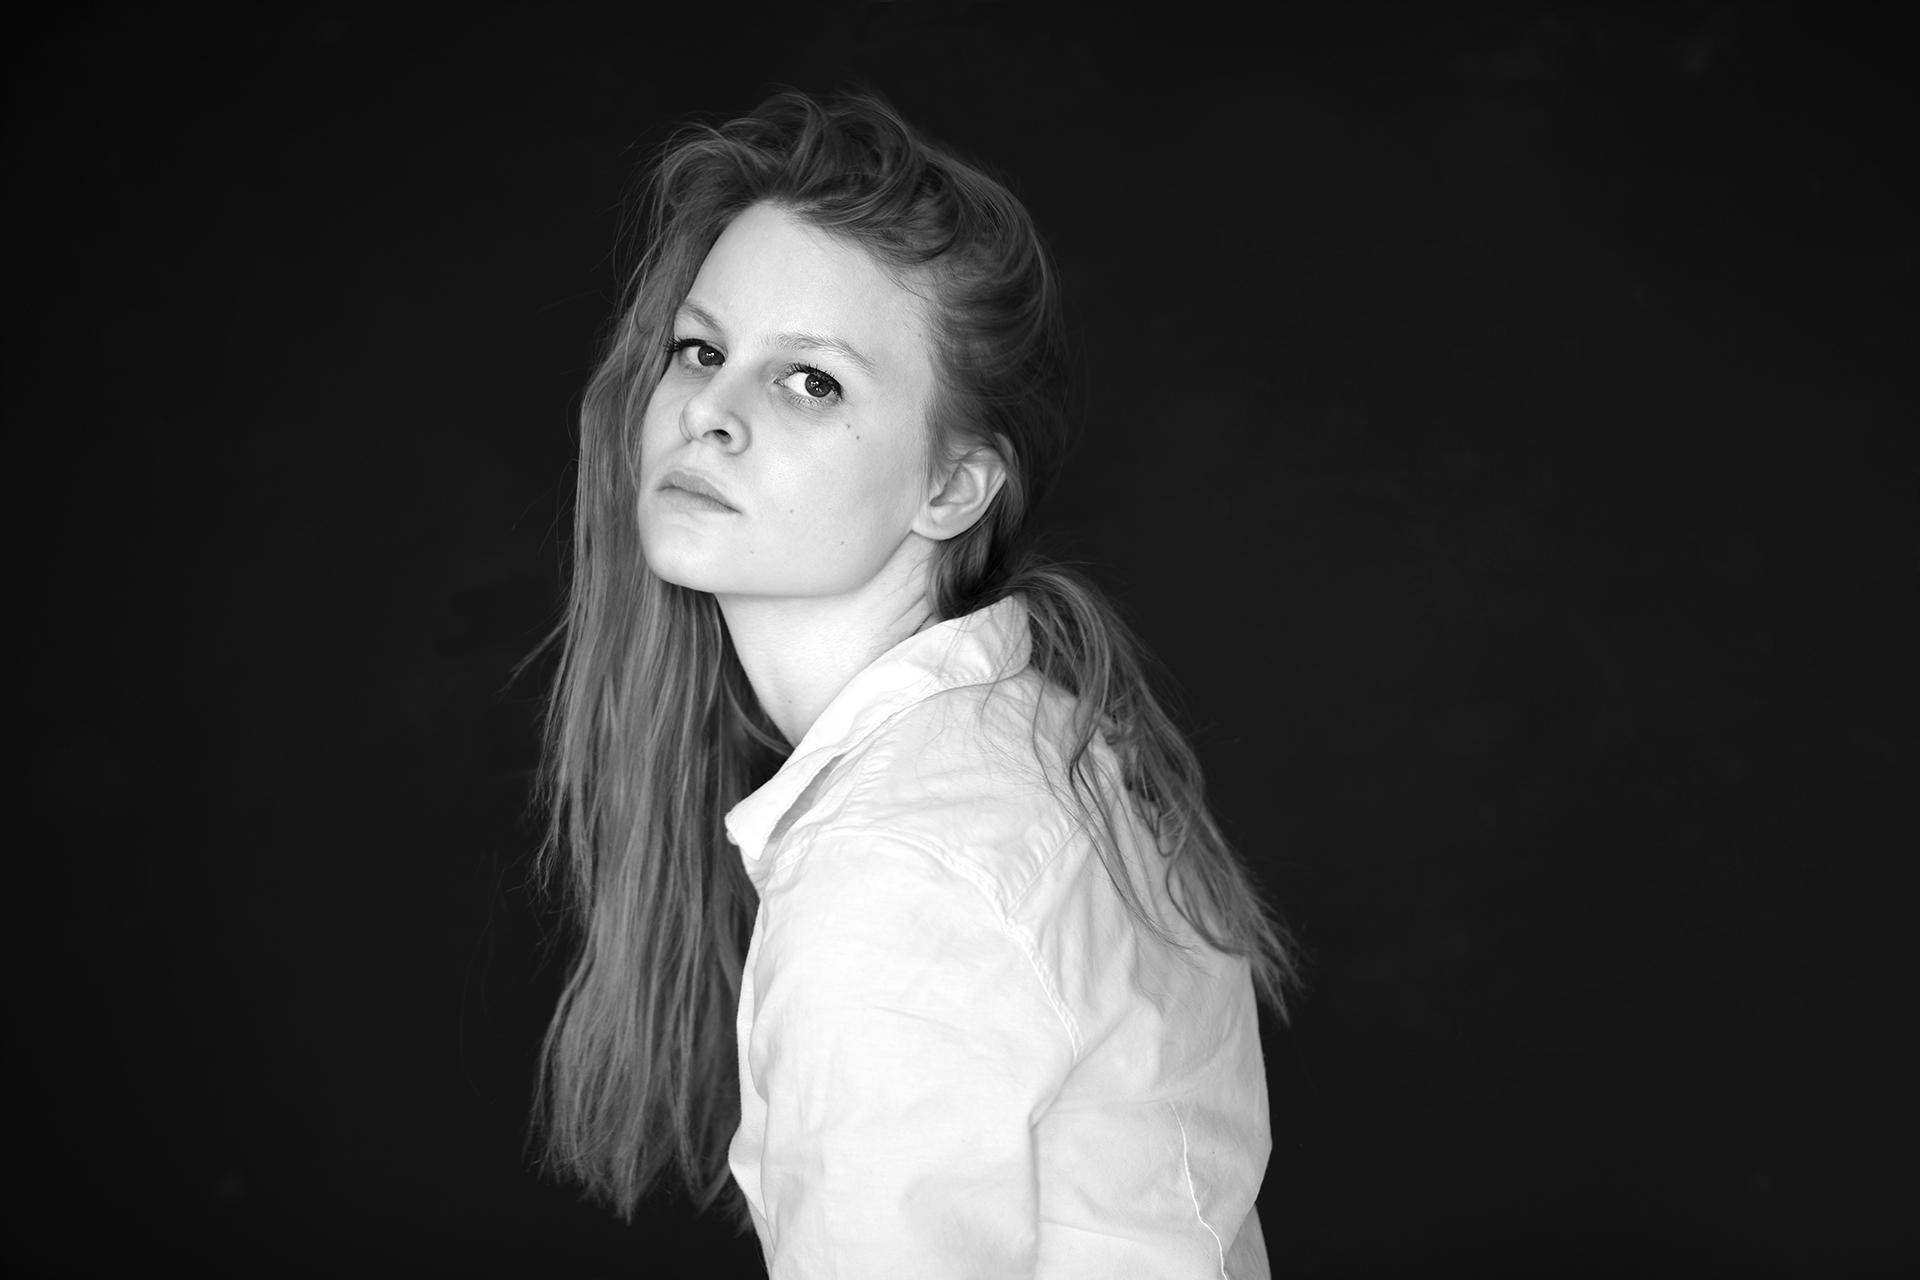 Kreative S/W Portraits mit Available Light - Canon Academy Portrait